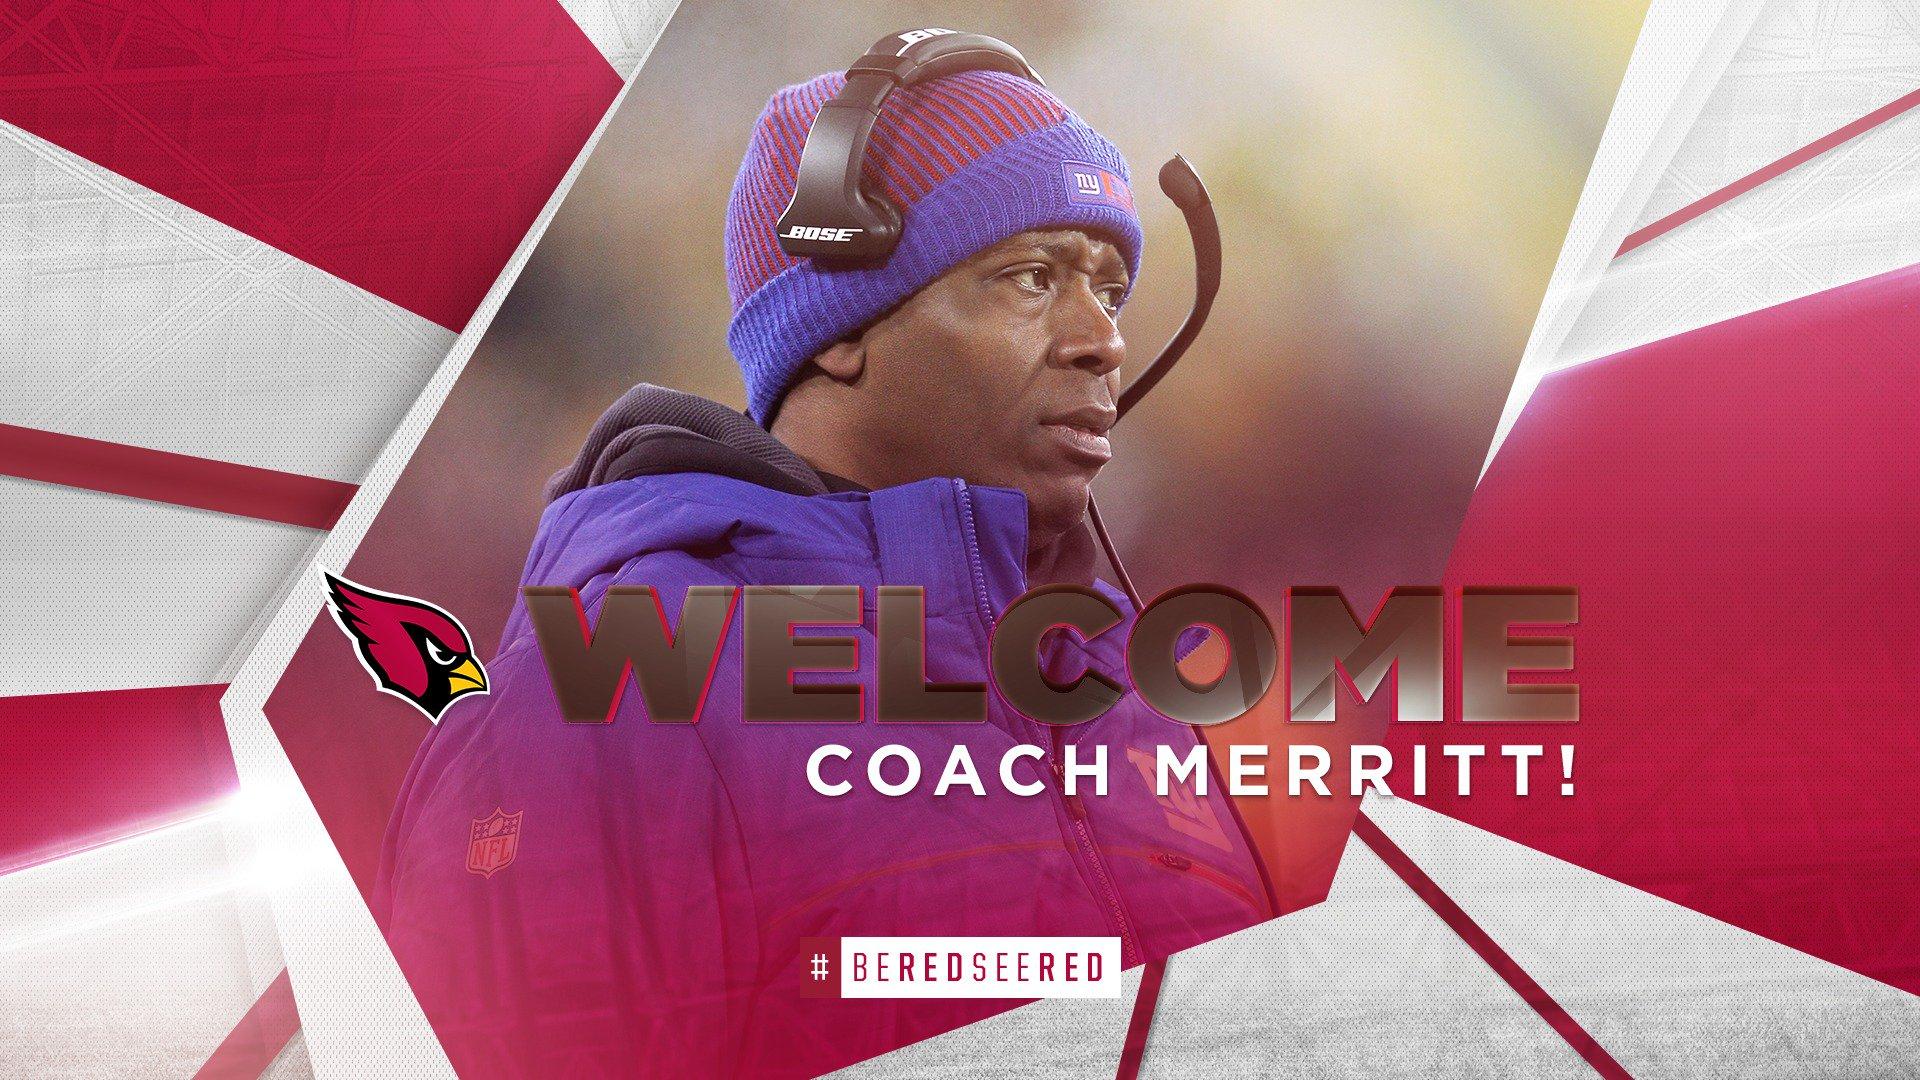 David Merritt is our new DBs coach. He played LB here from 1993-95. https://t.co/fNahGnEHn1